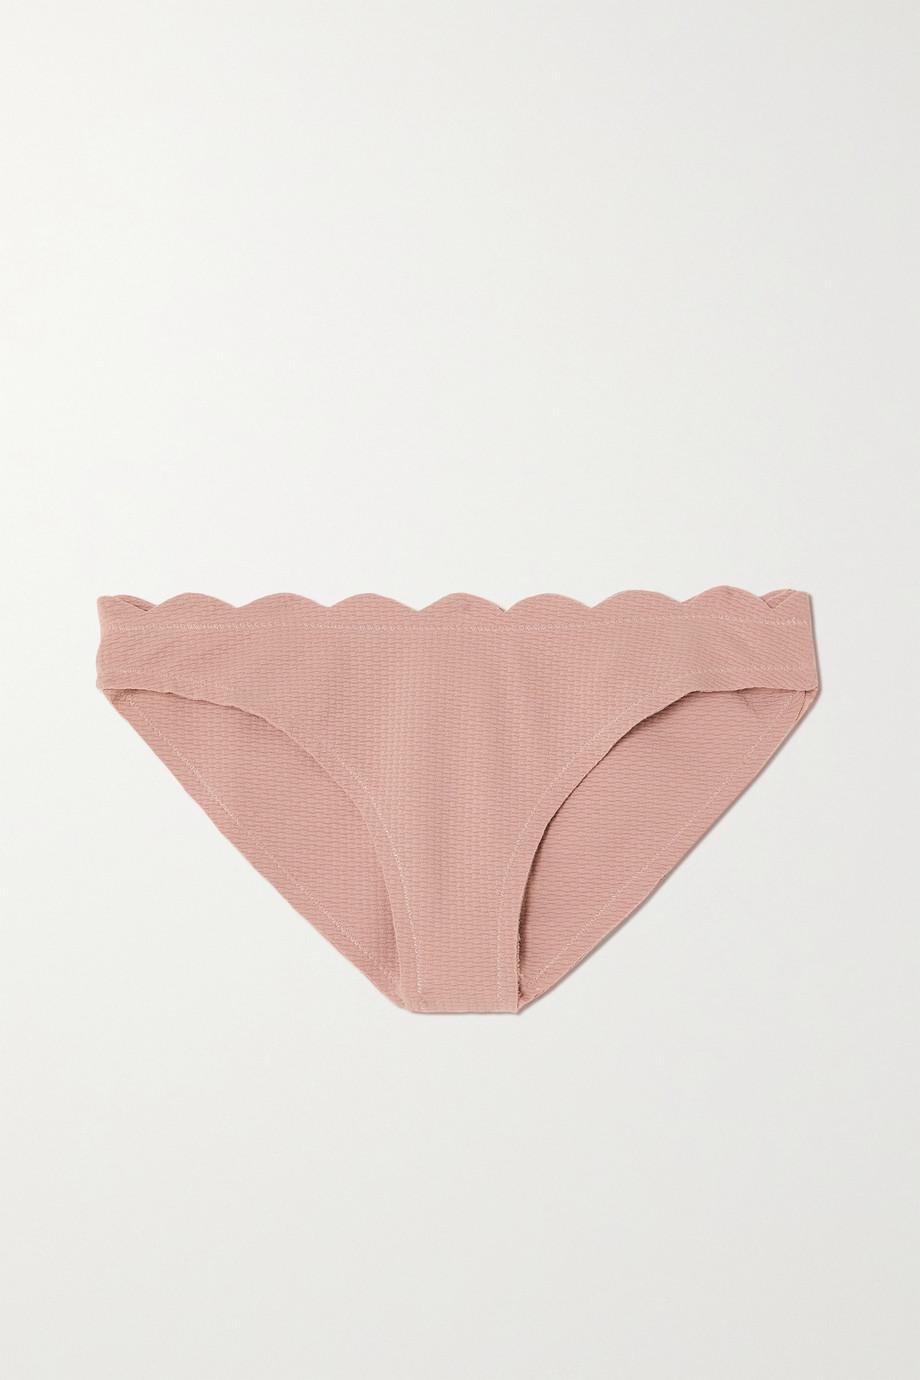 Marysia + NET SUSTAIN Santa Barbara scalloped recycled seersucker bikini briefs